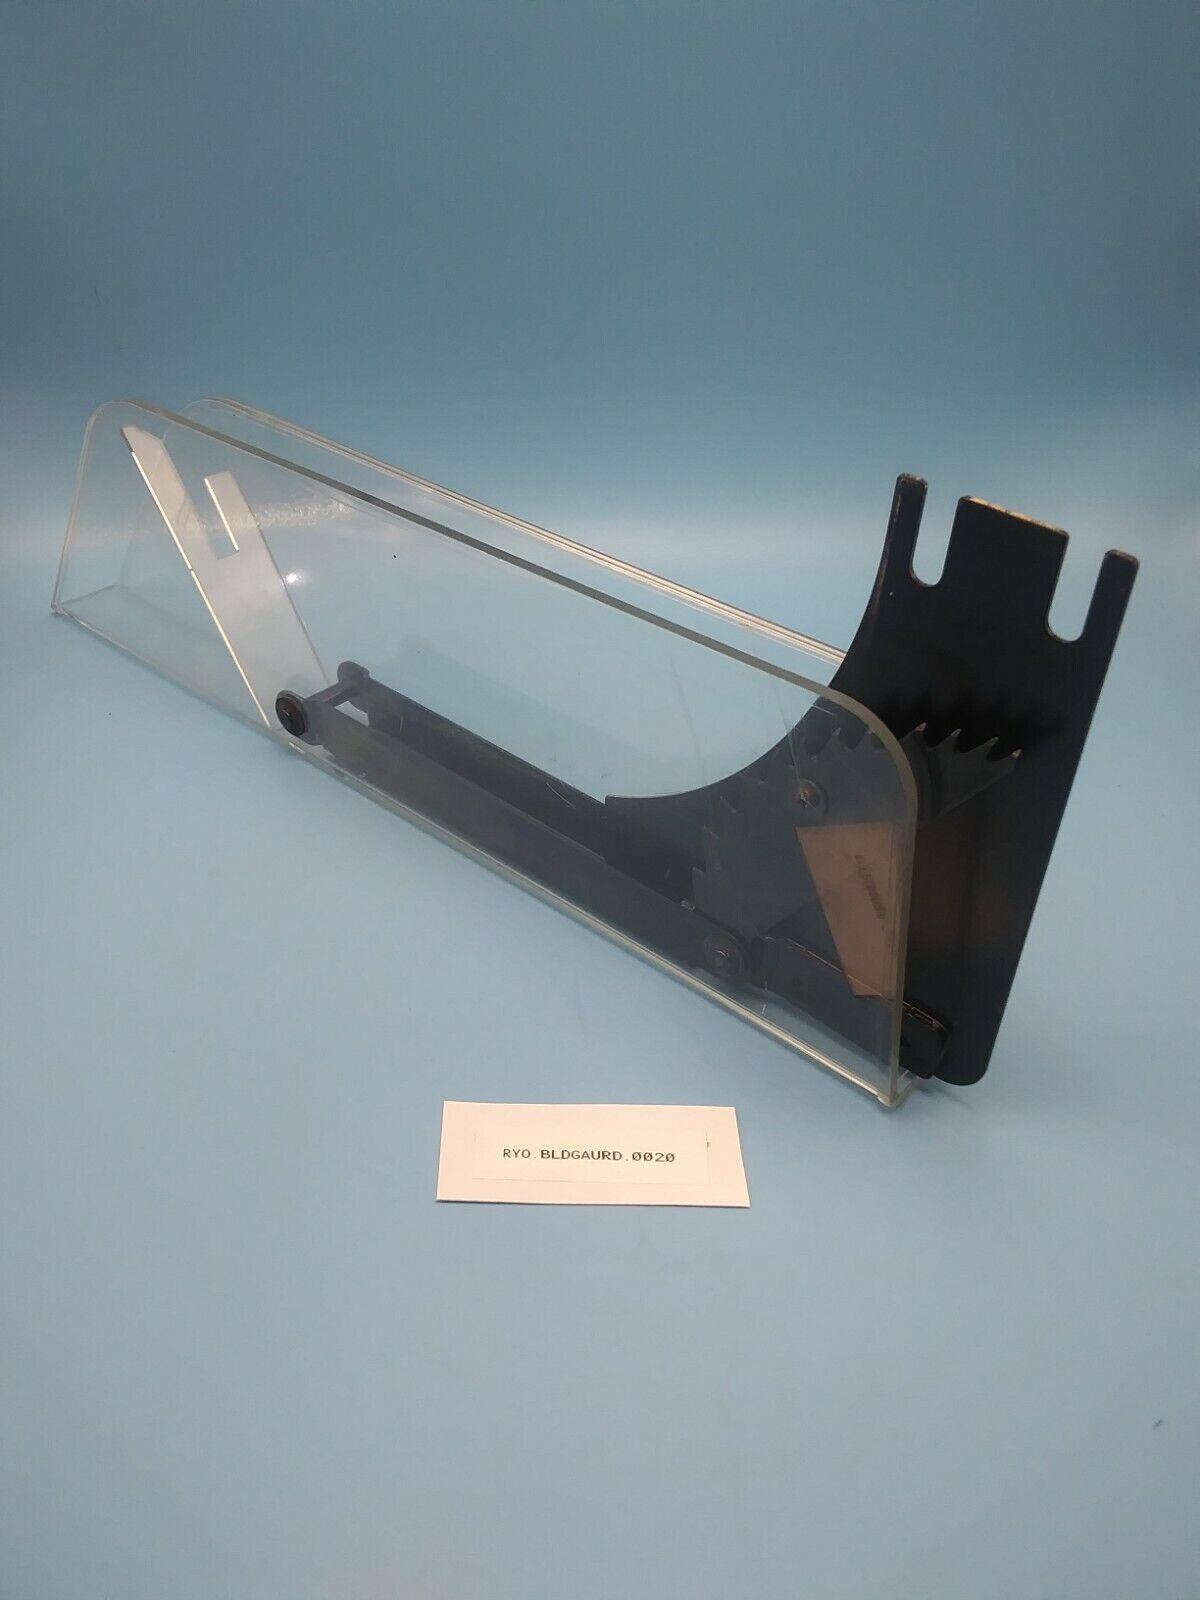 Ryobi BT3000/BT3100 Table Saw Blade Guard